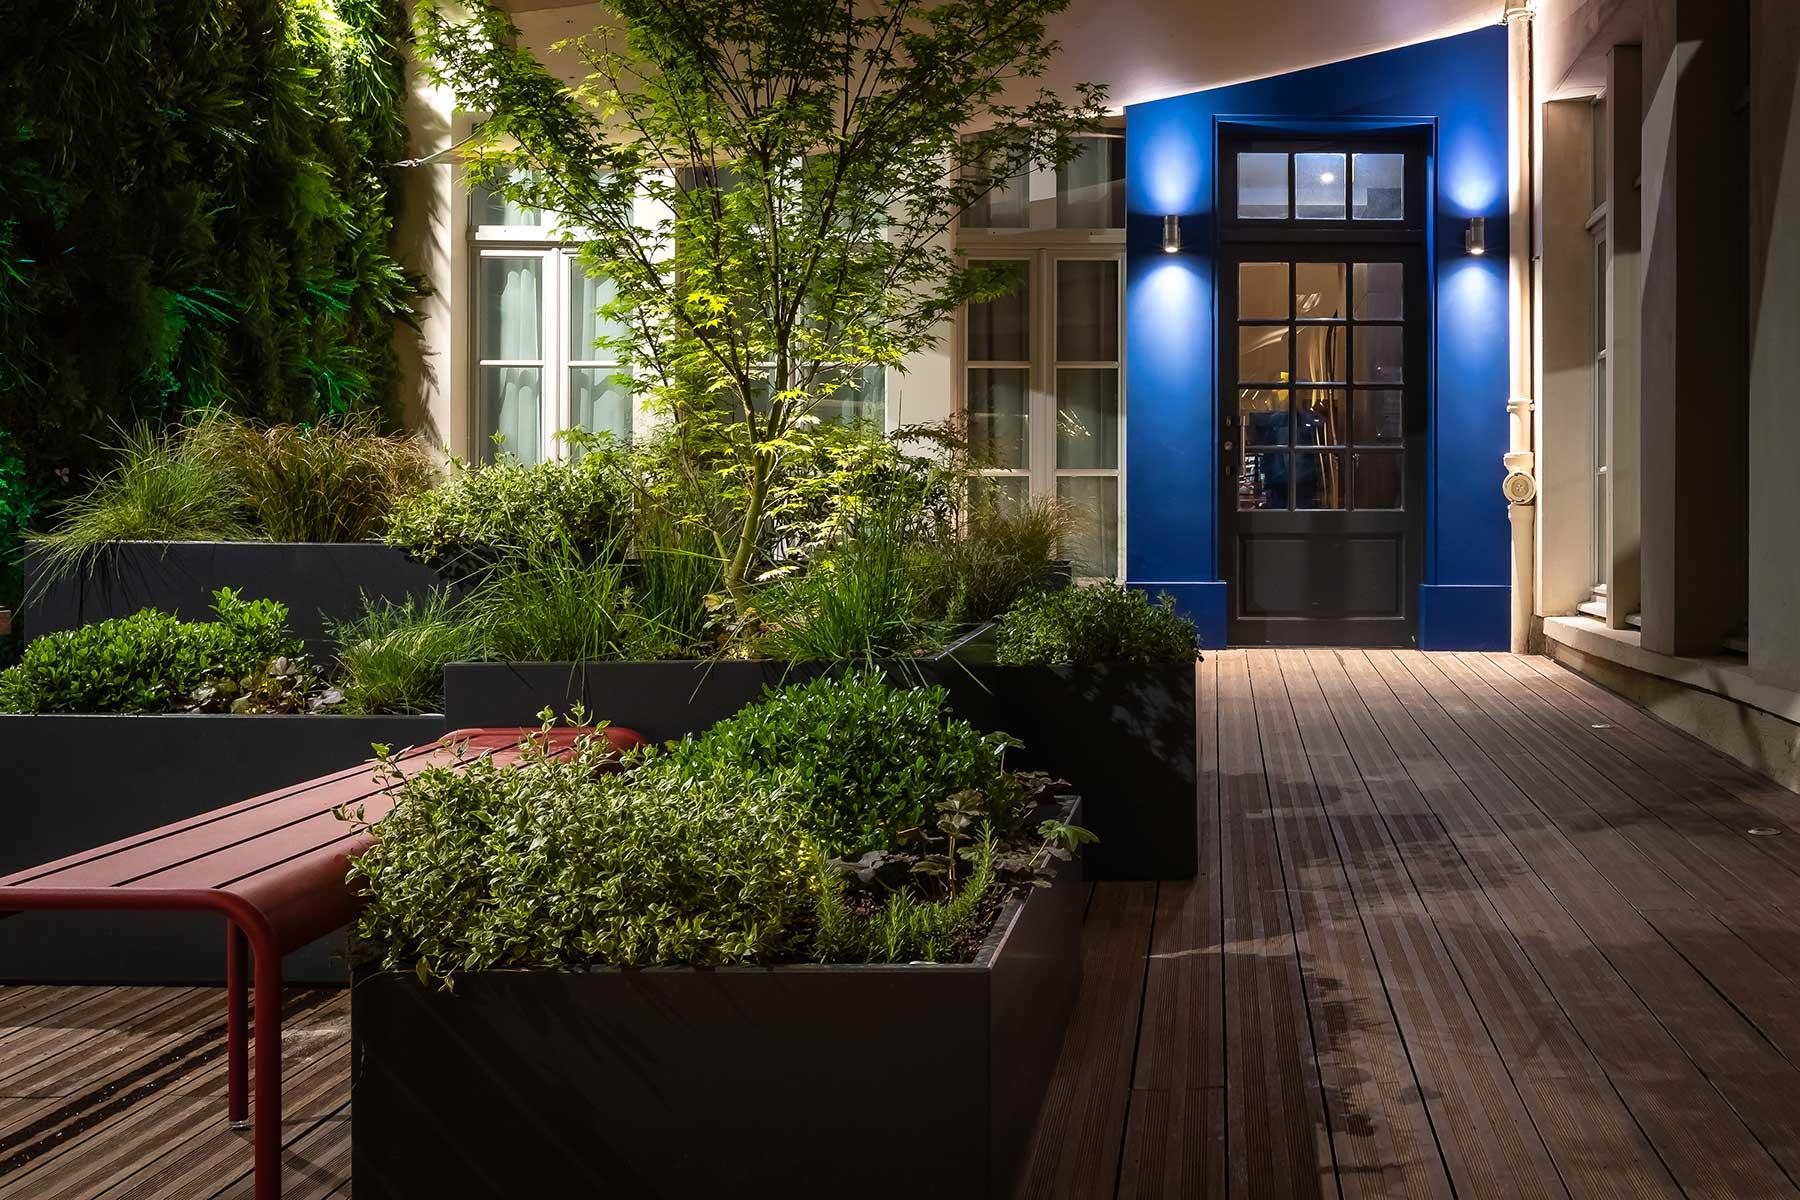 jardini res fibre ciment sur mesure image in composition. Black Bedroom Furniture Sets. Home Design Ideas